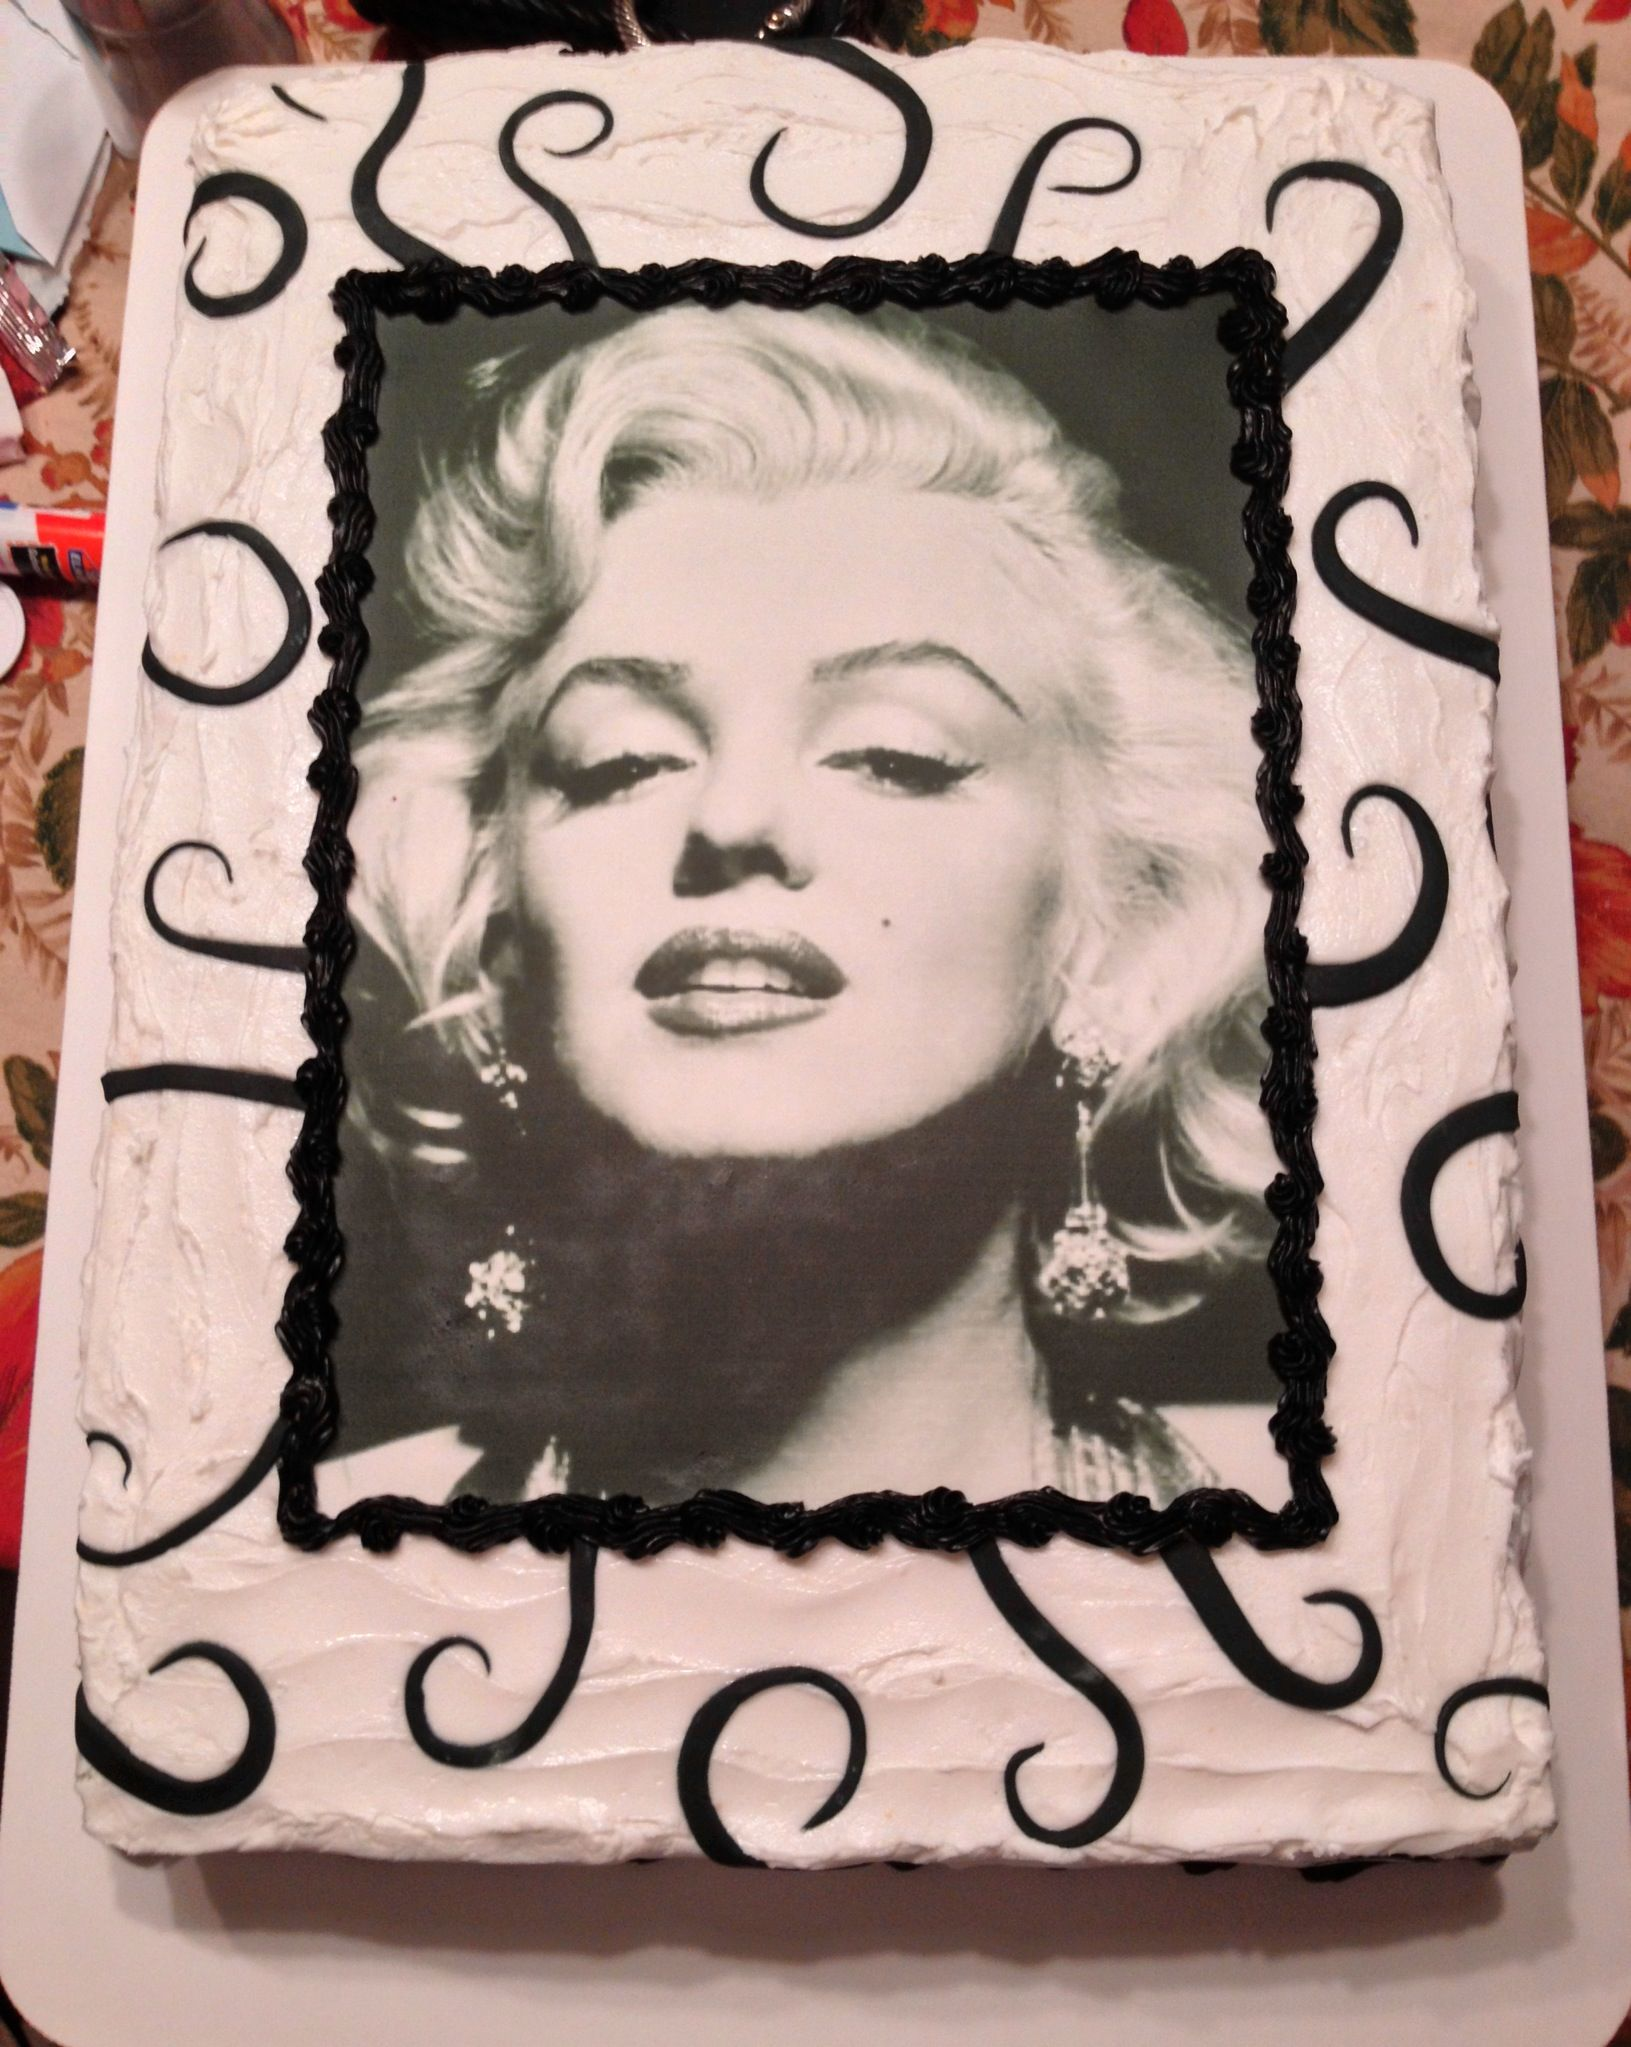 Marilyn Monroe Cake The Great Cakery In 2019 Marilyn